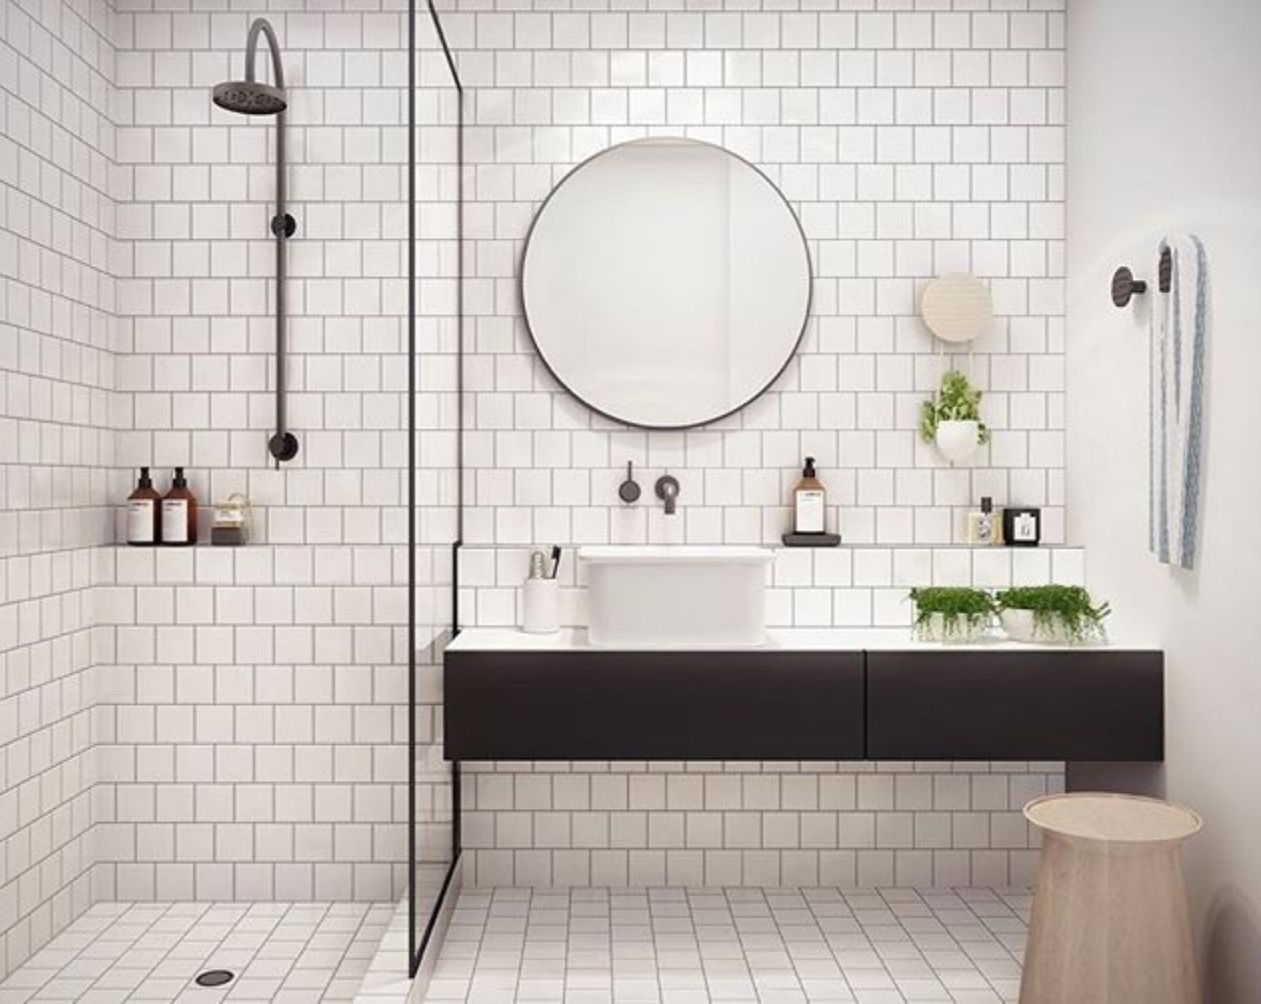 Pin by Sam Mangone on Future home   Pinterest   Interiors, Bathroom ...